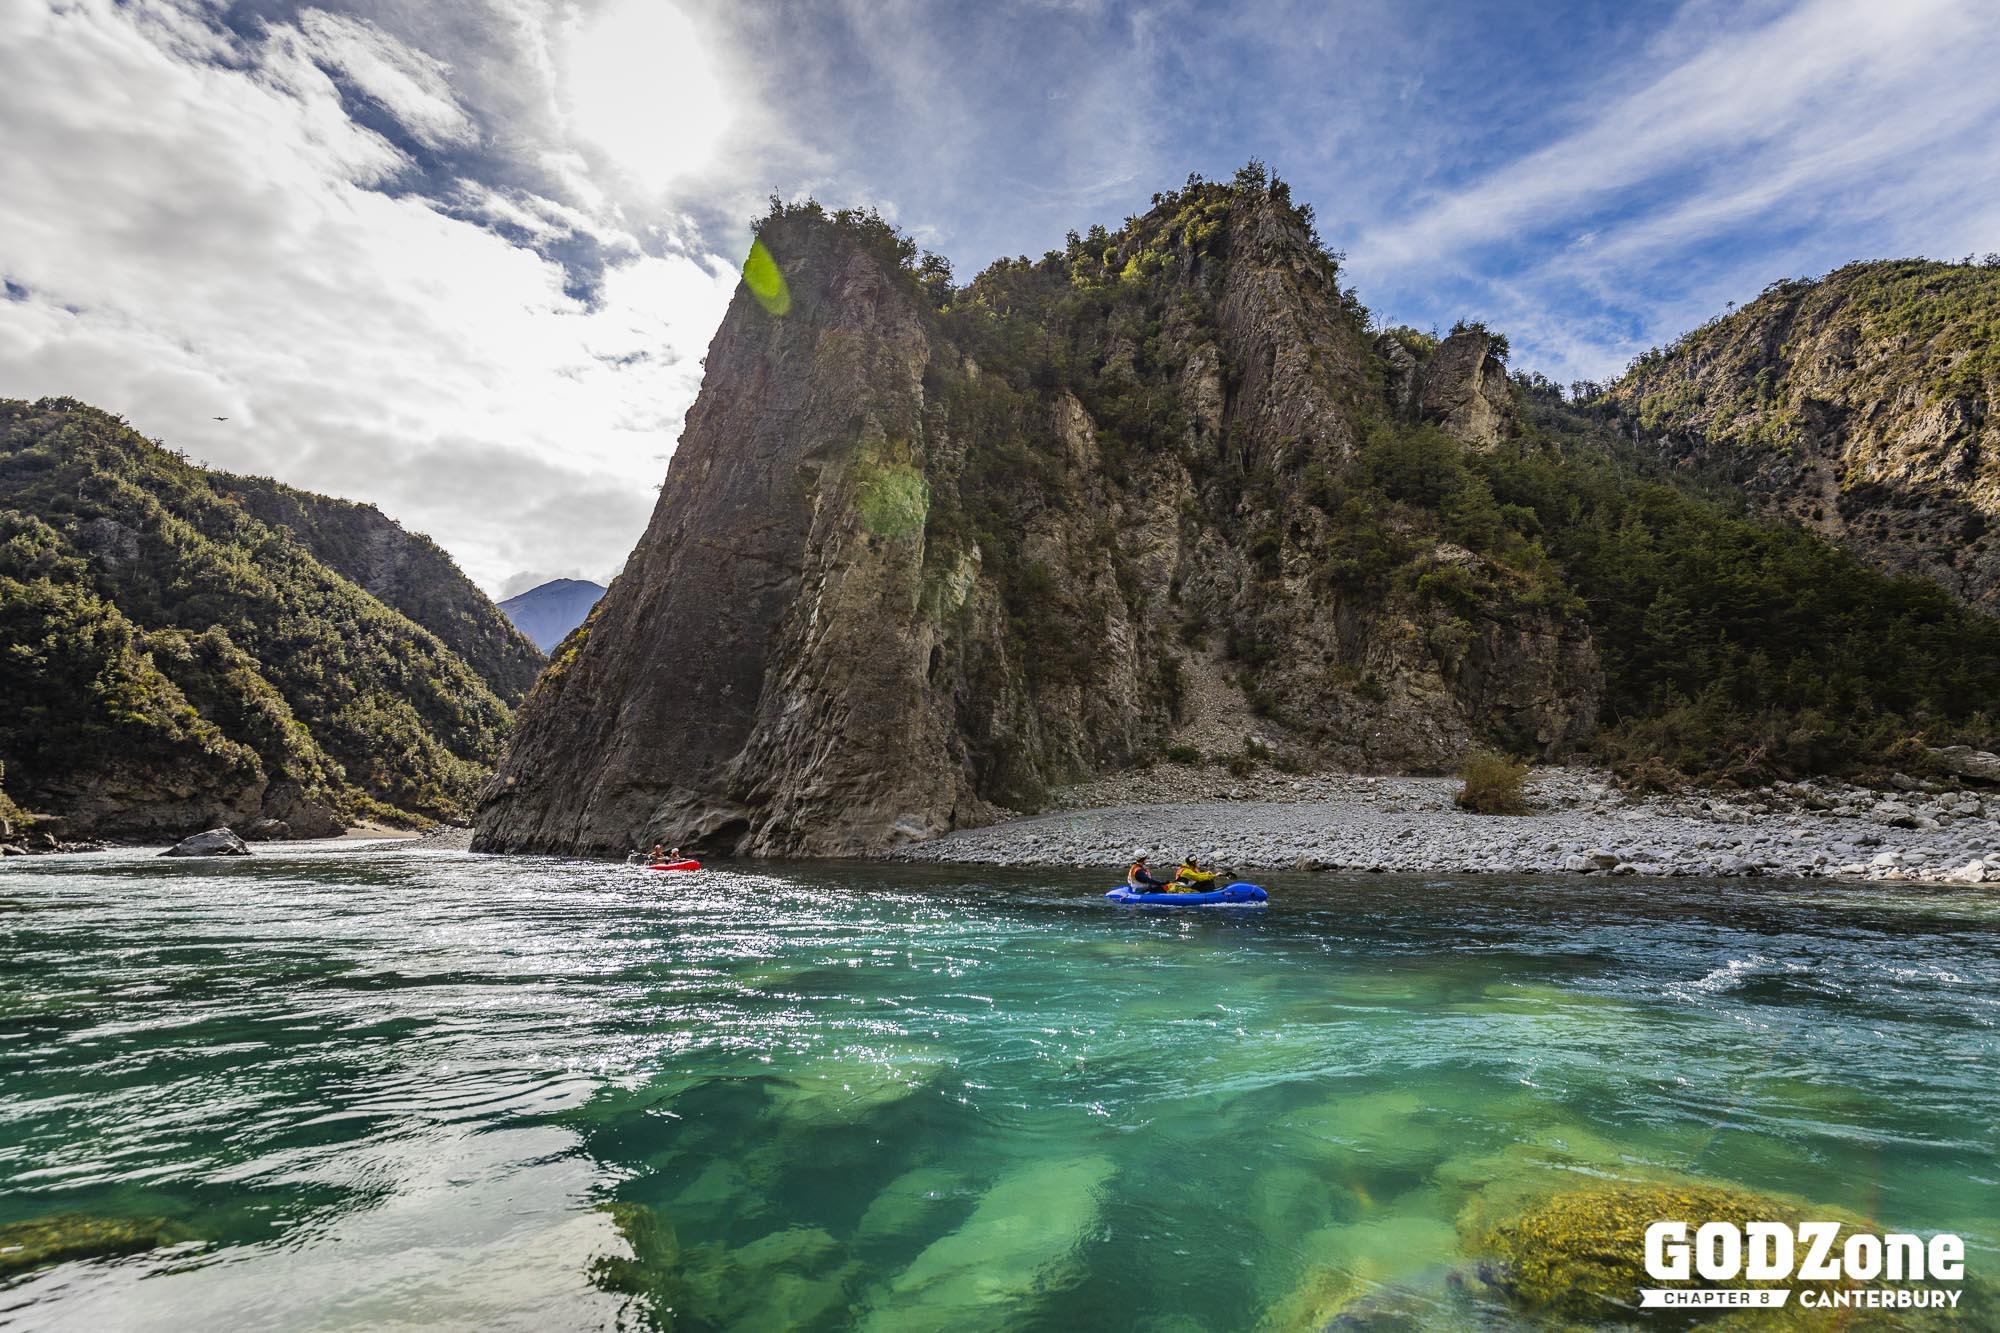 Day 2 : Paddling the Poulter River - photo GODZone, Alexandre Socci